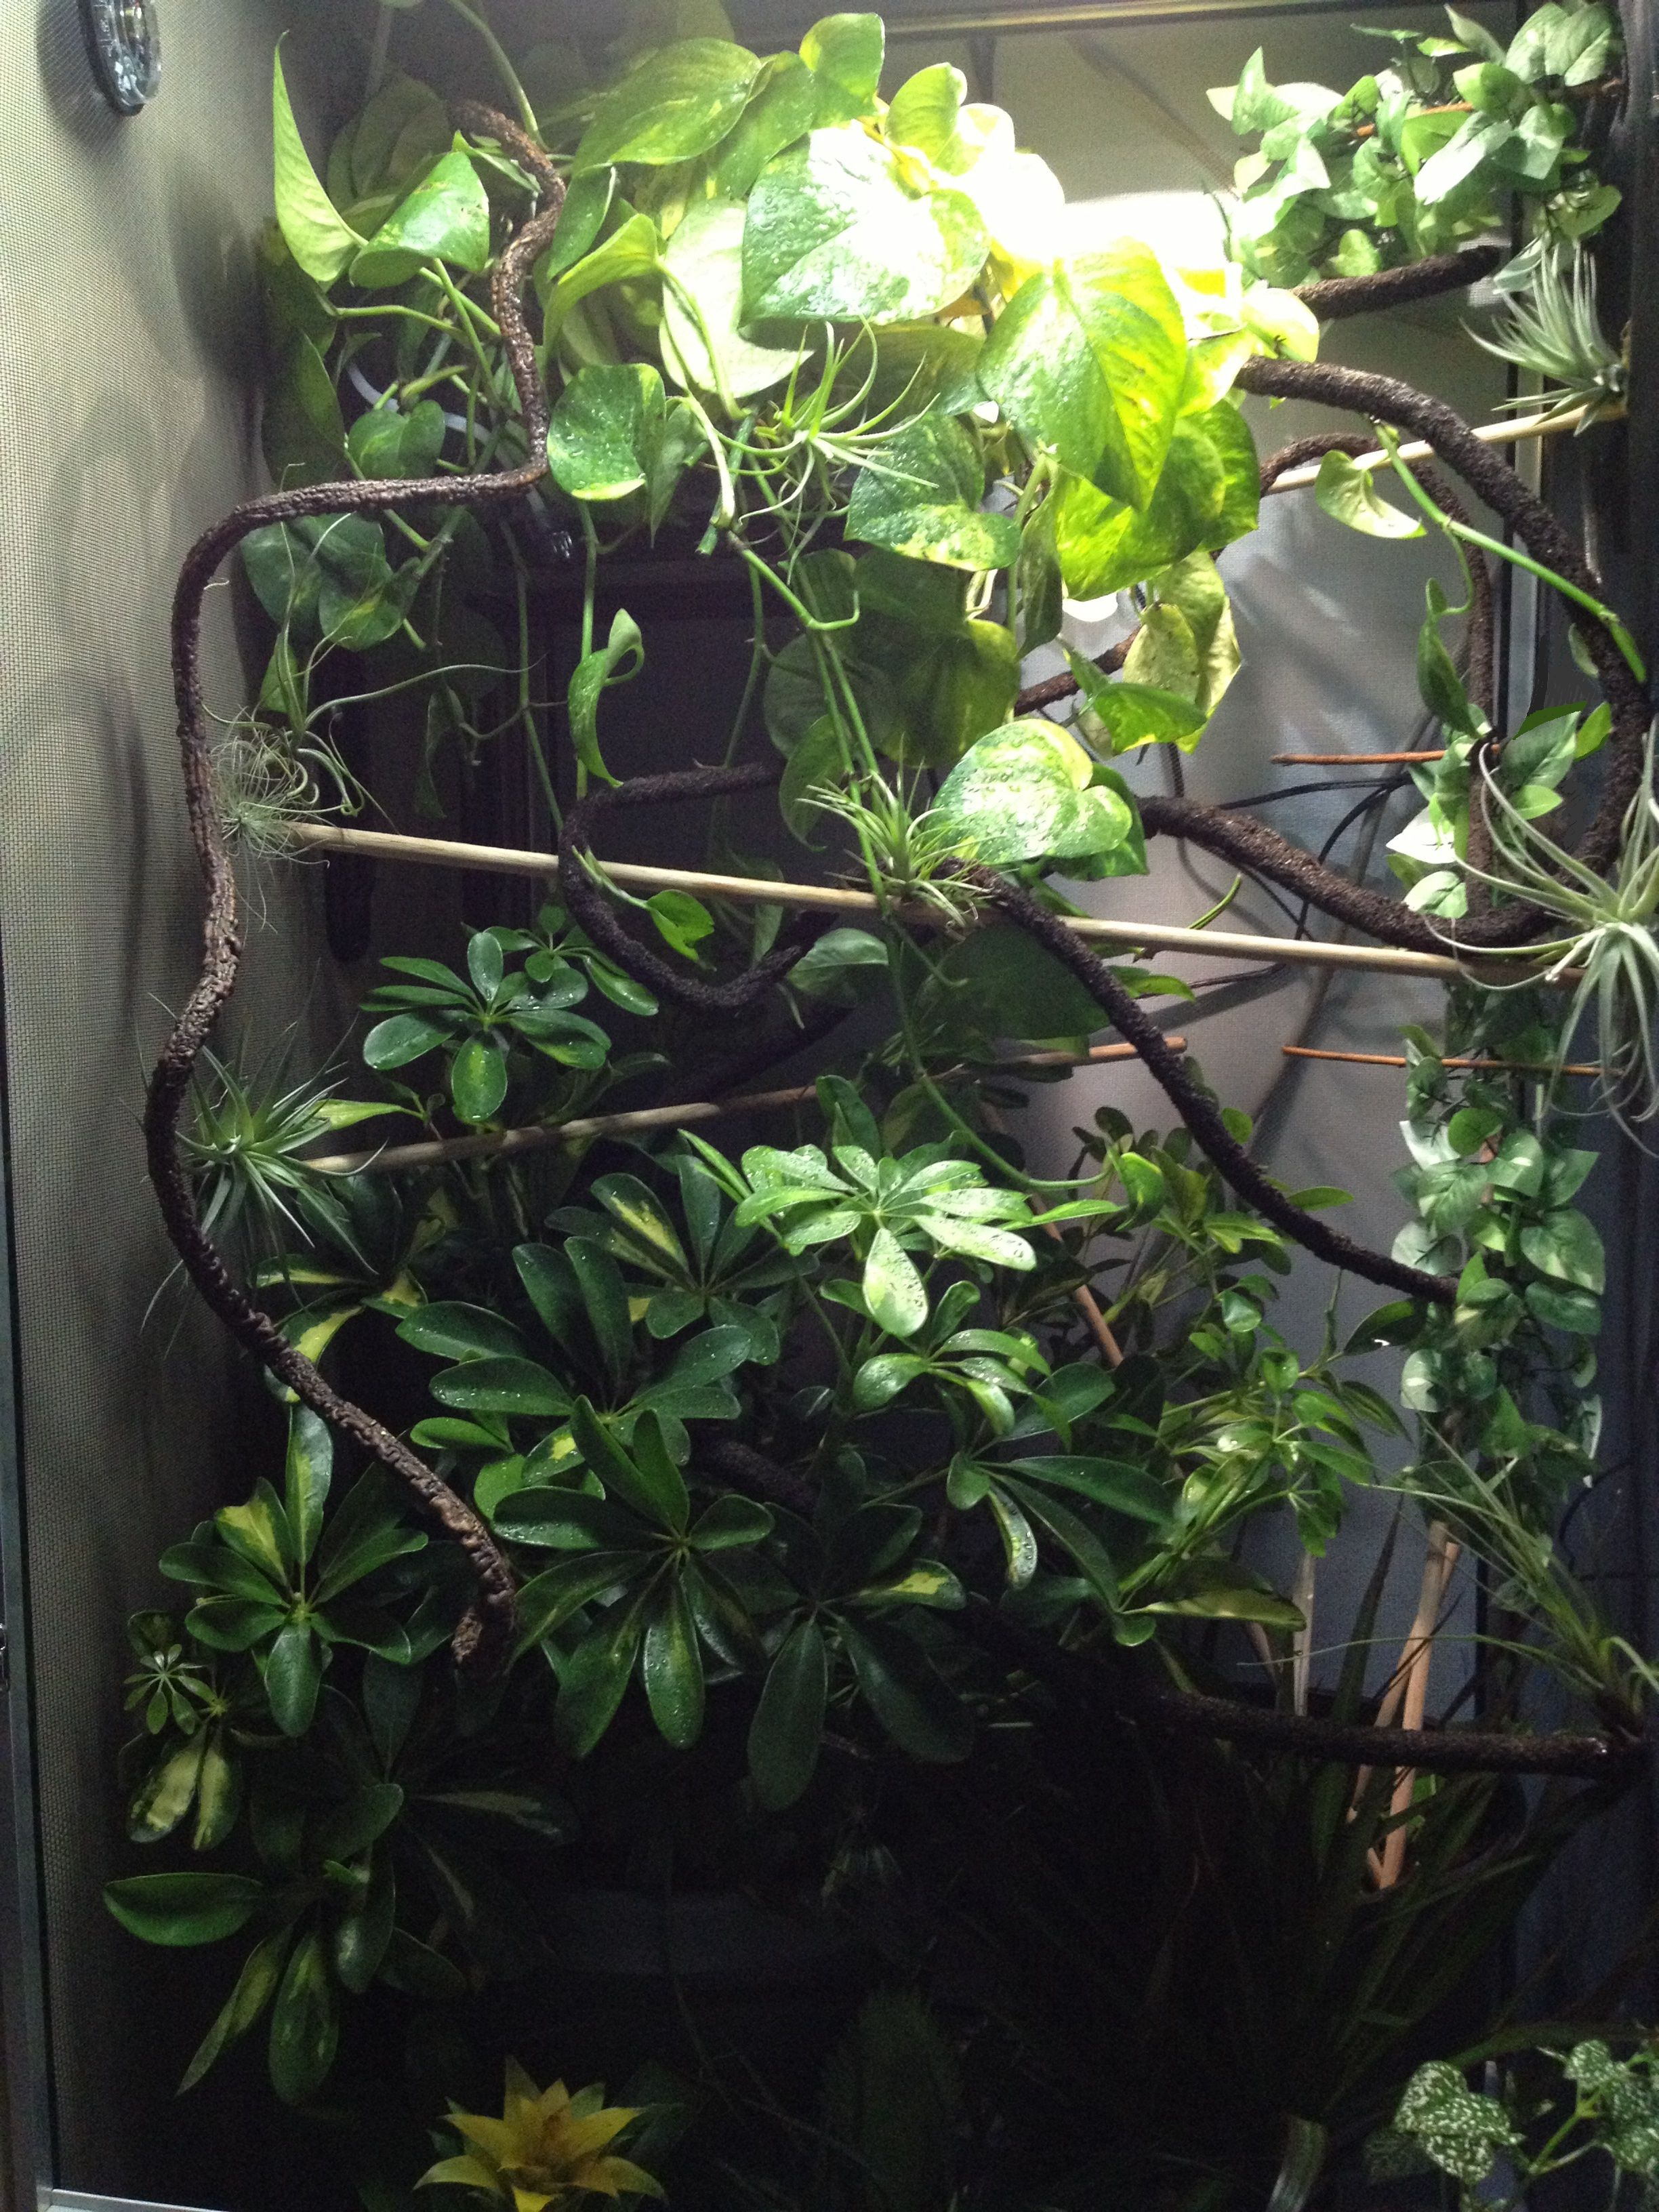 Chameleon Cage / Enclosure | Chameleon Love | Pinterest ...